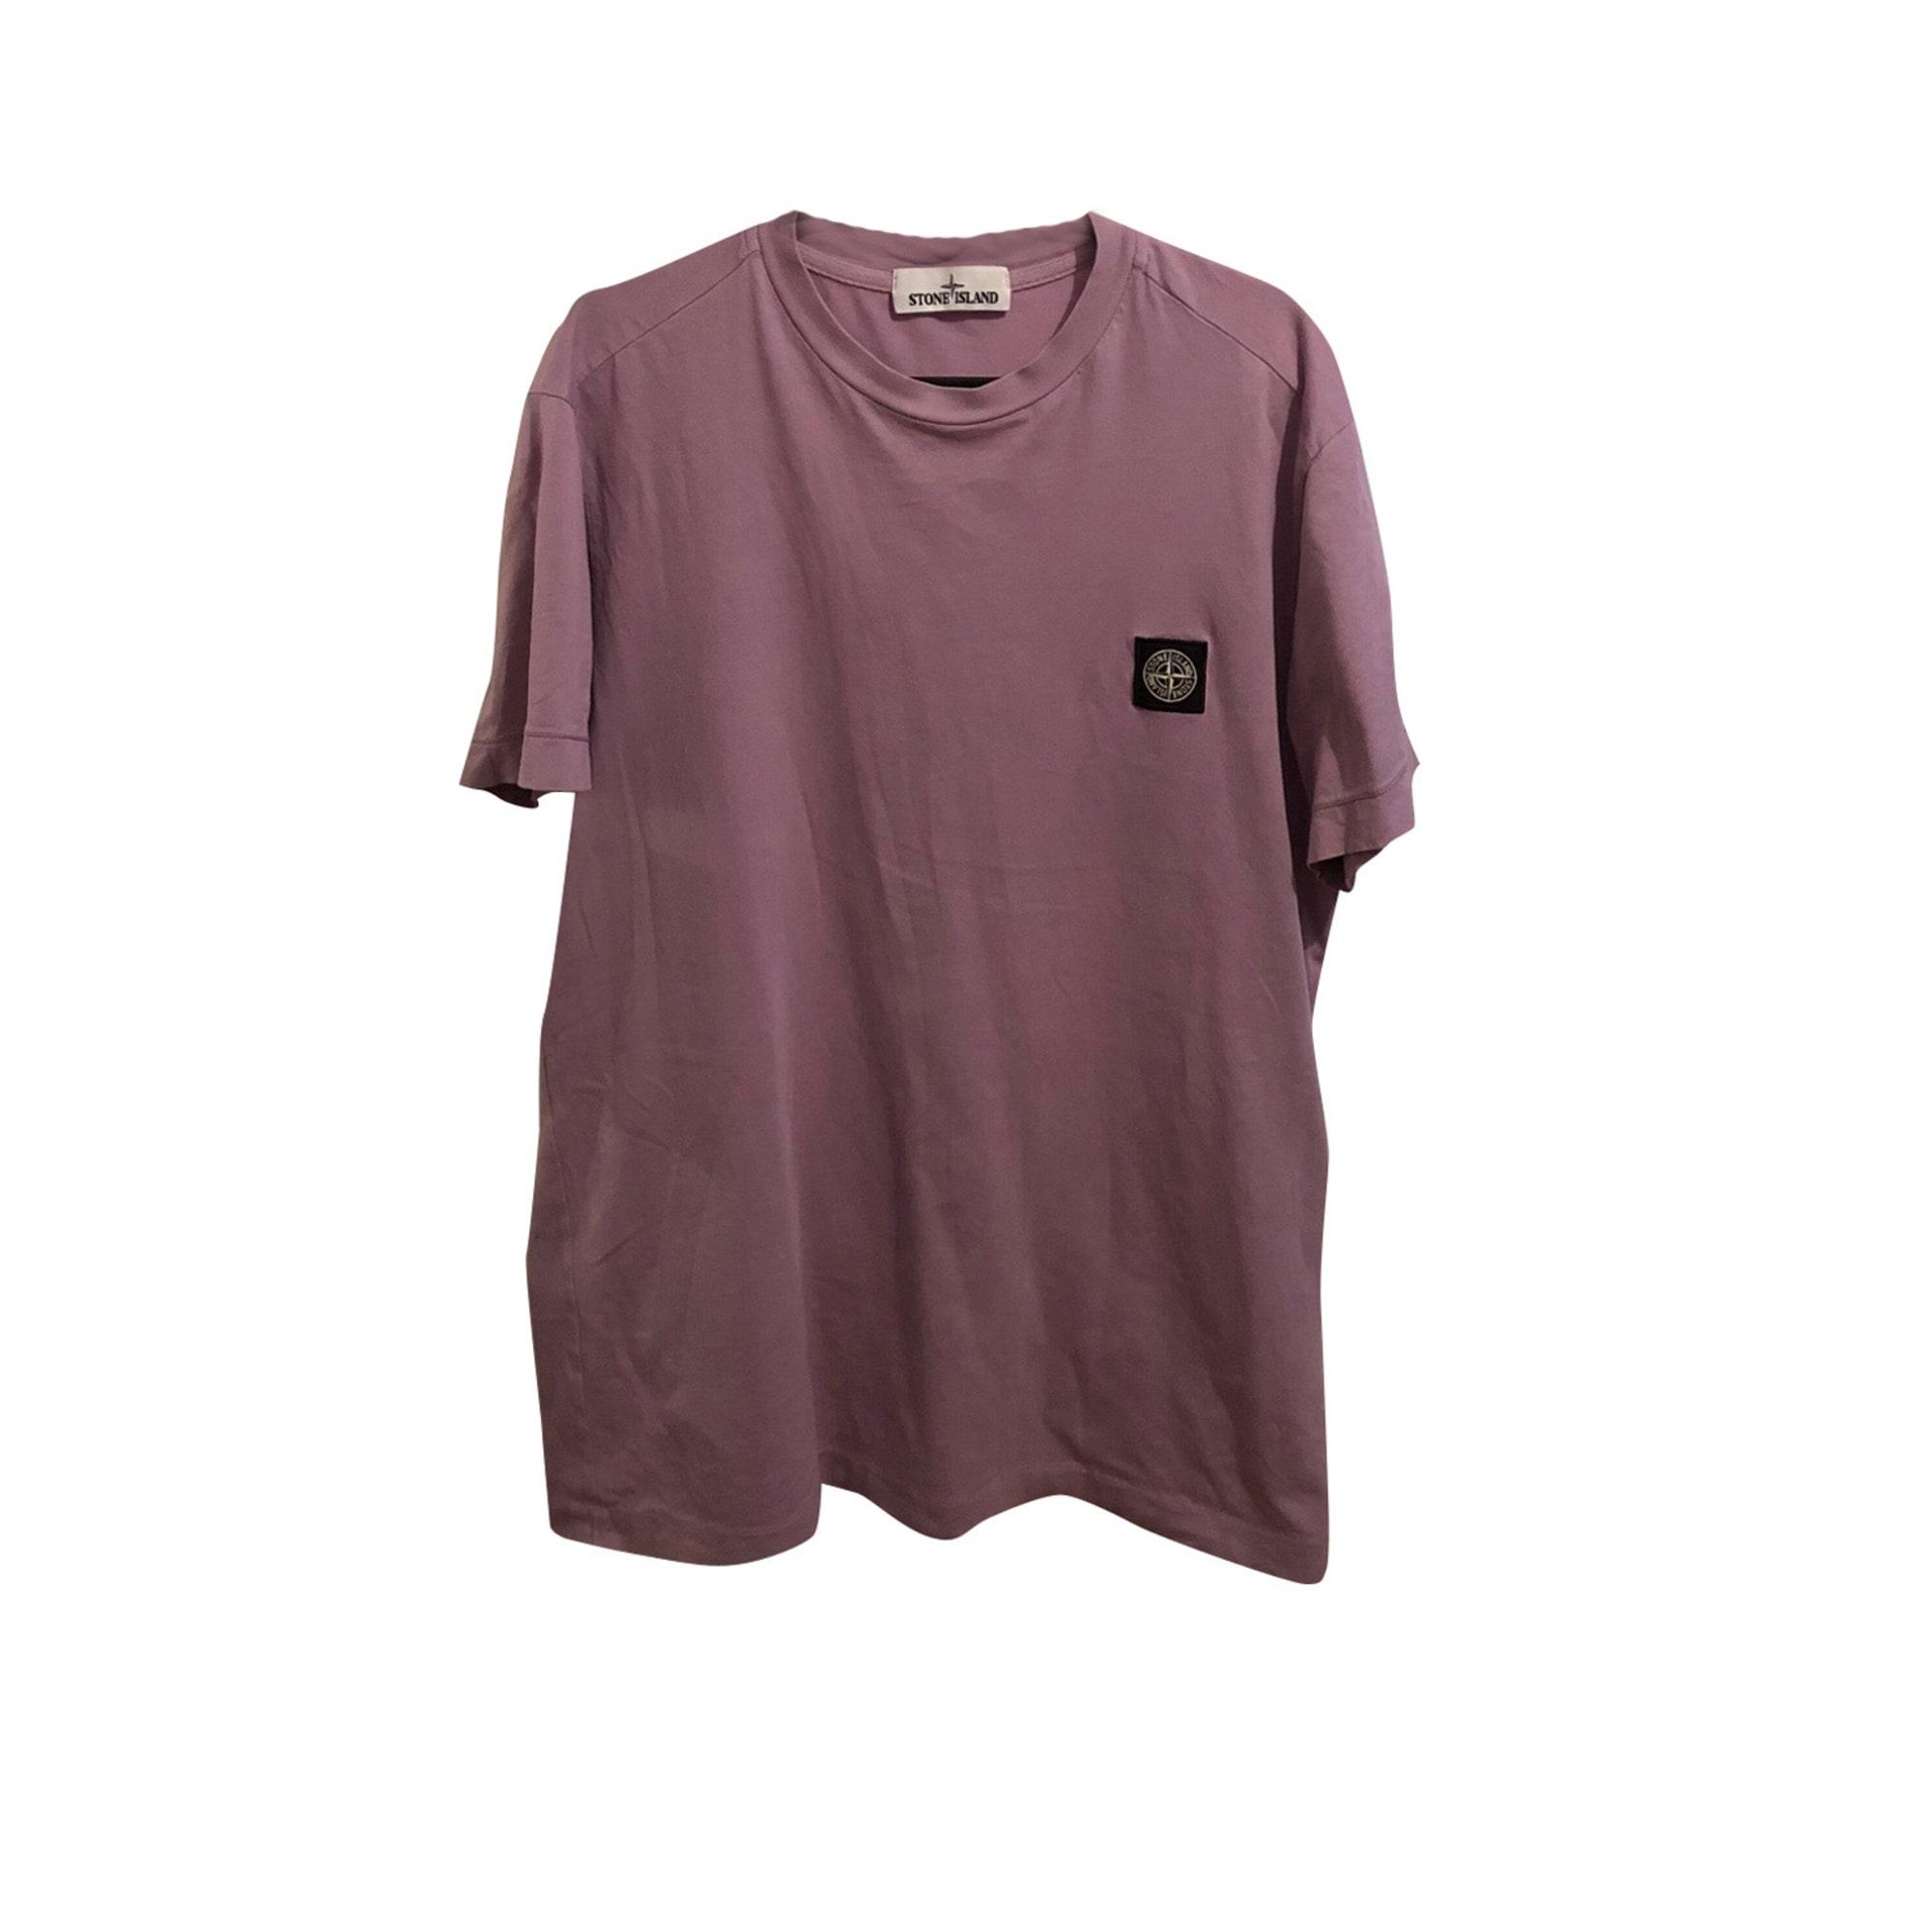 T-shirt STONE ISLAND Purple, mauve, lavender